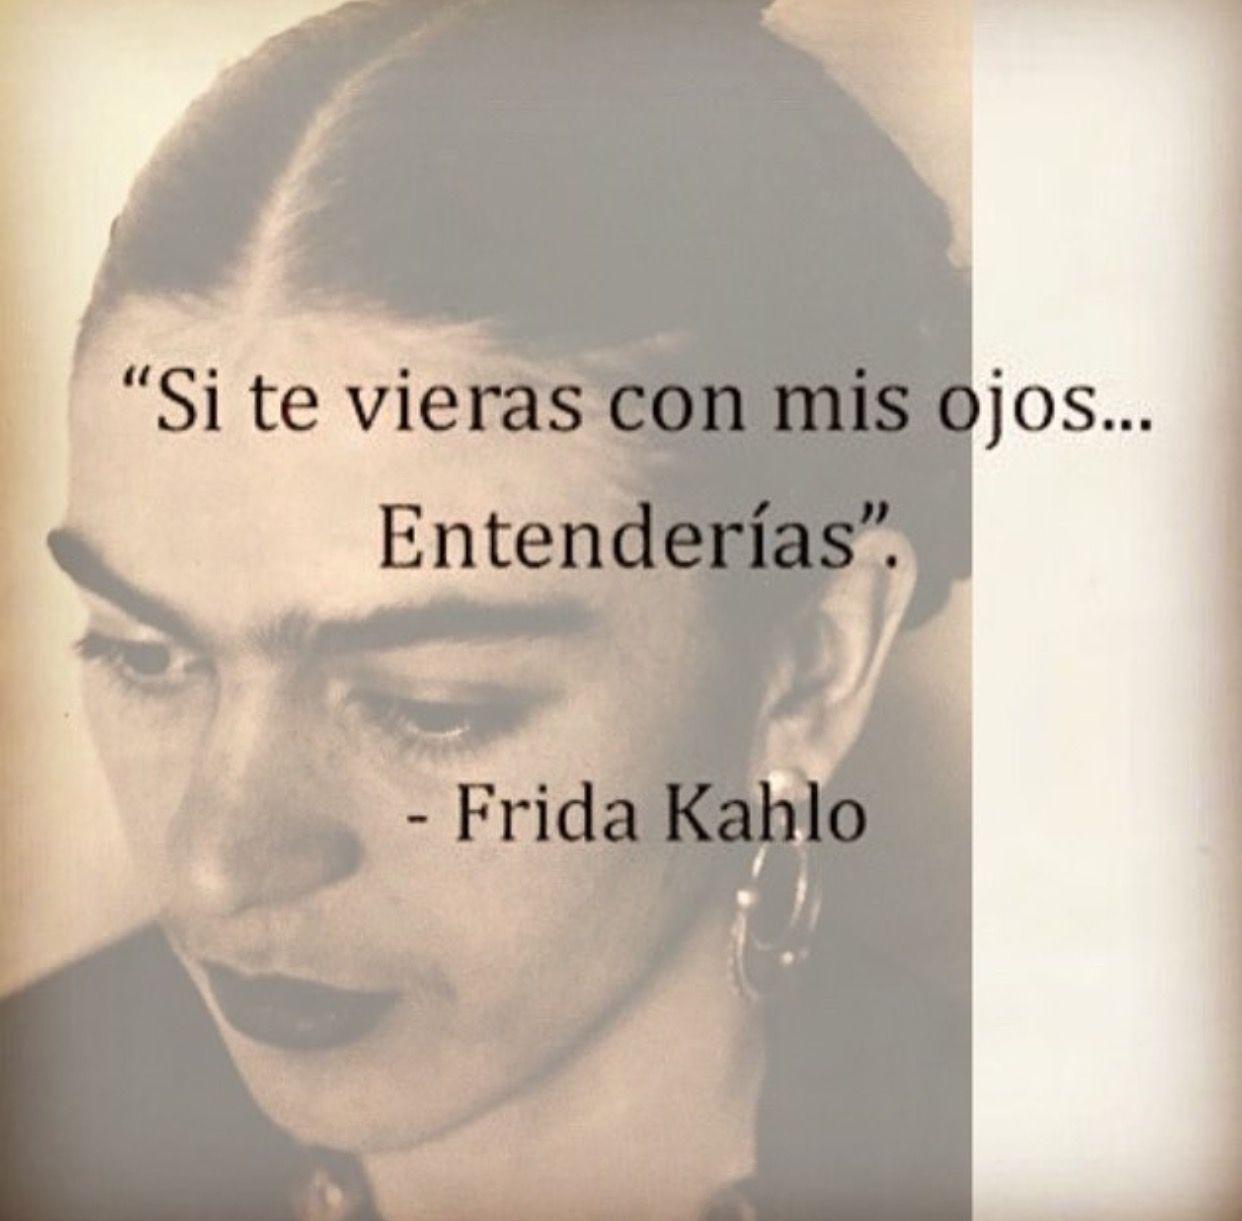 Yo Te Cielo Youtube Frases De Amor Frida Kahlo Yo Te Cielo